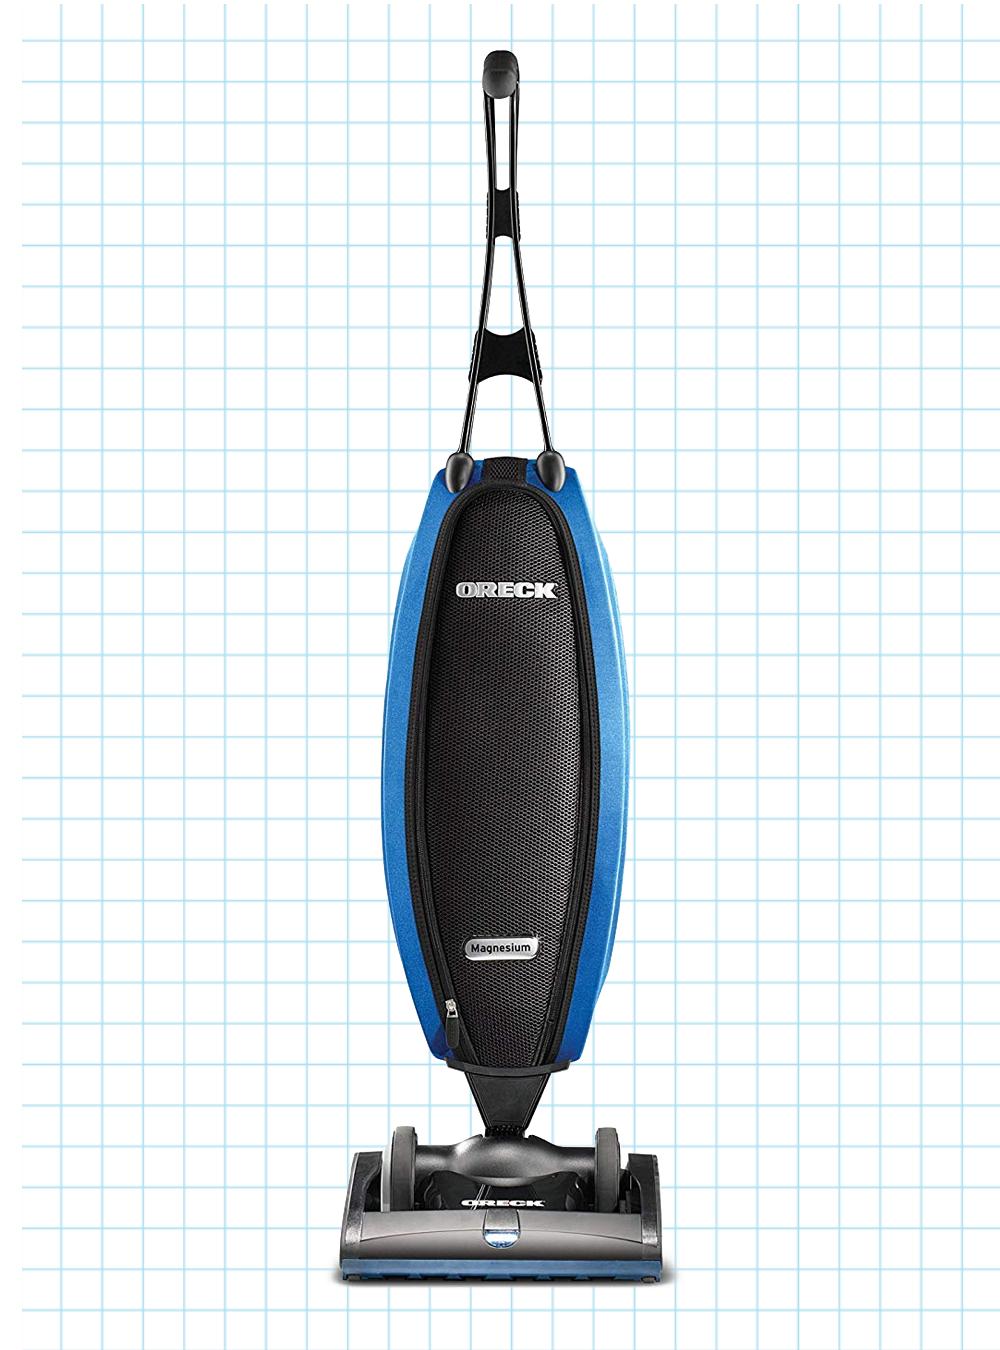 Best cordless vacuum for hardwood floors and pet hair 2020